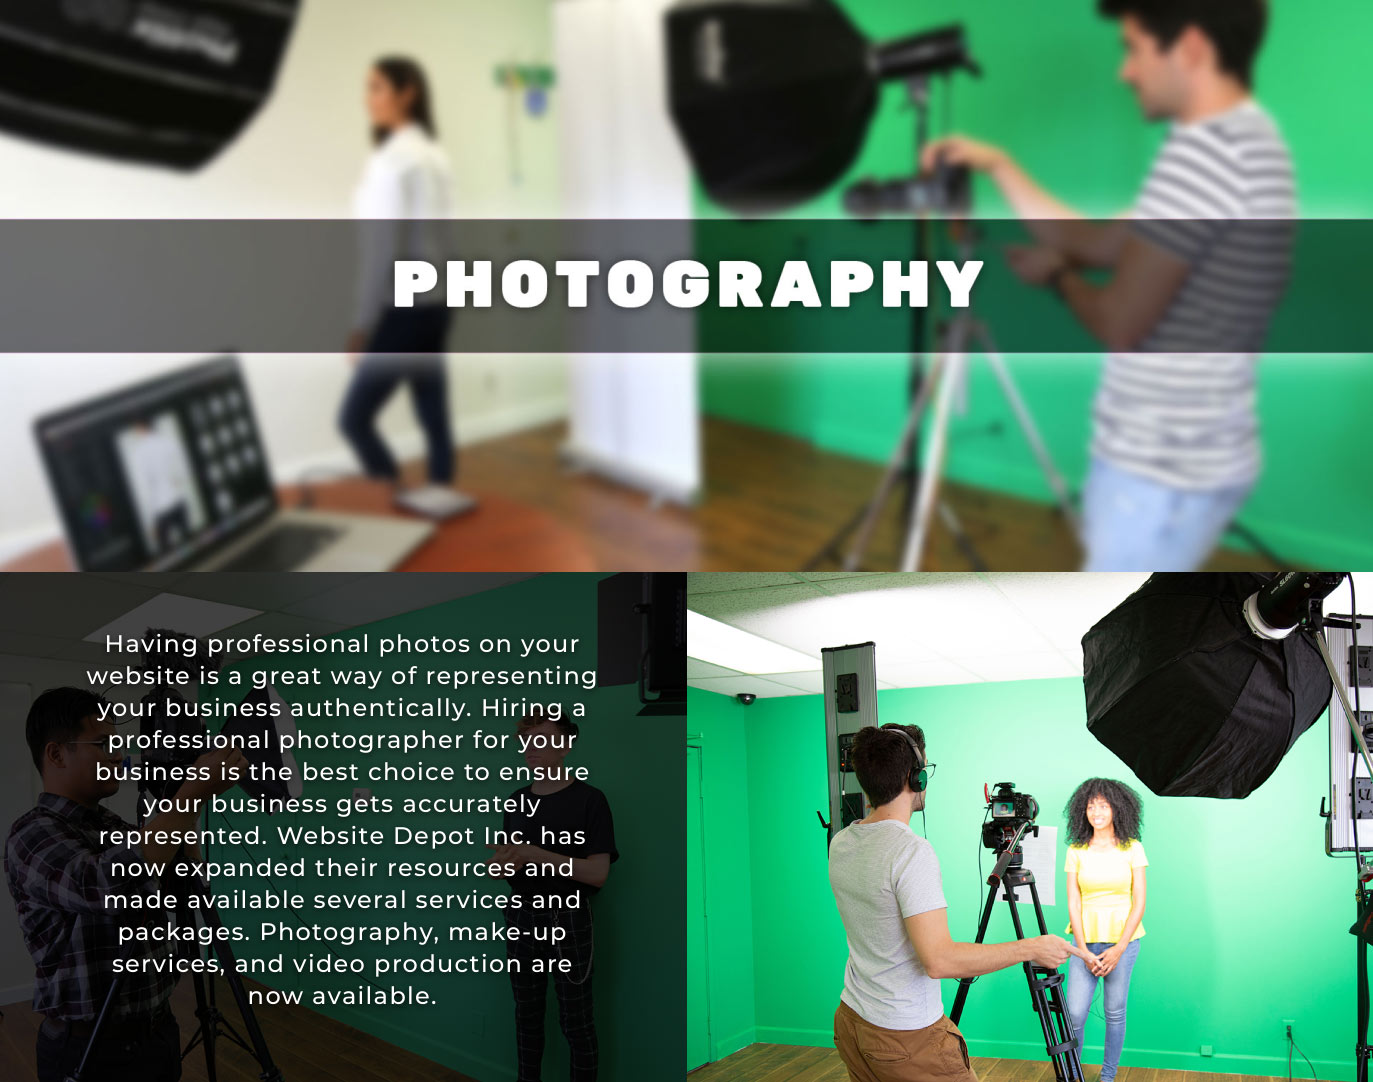 photography page main heading